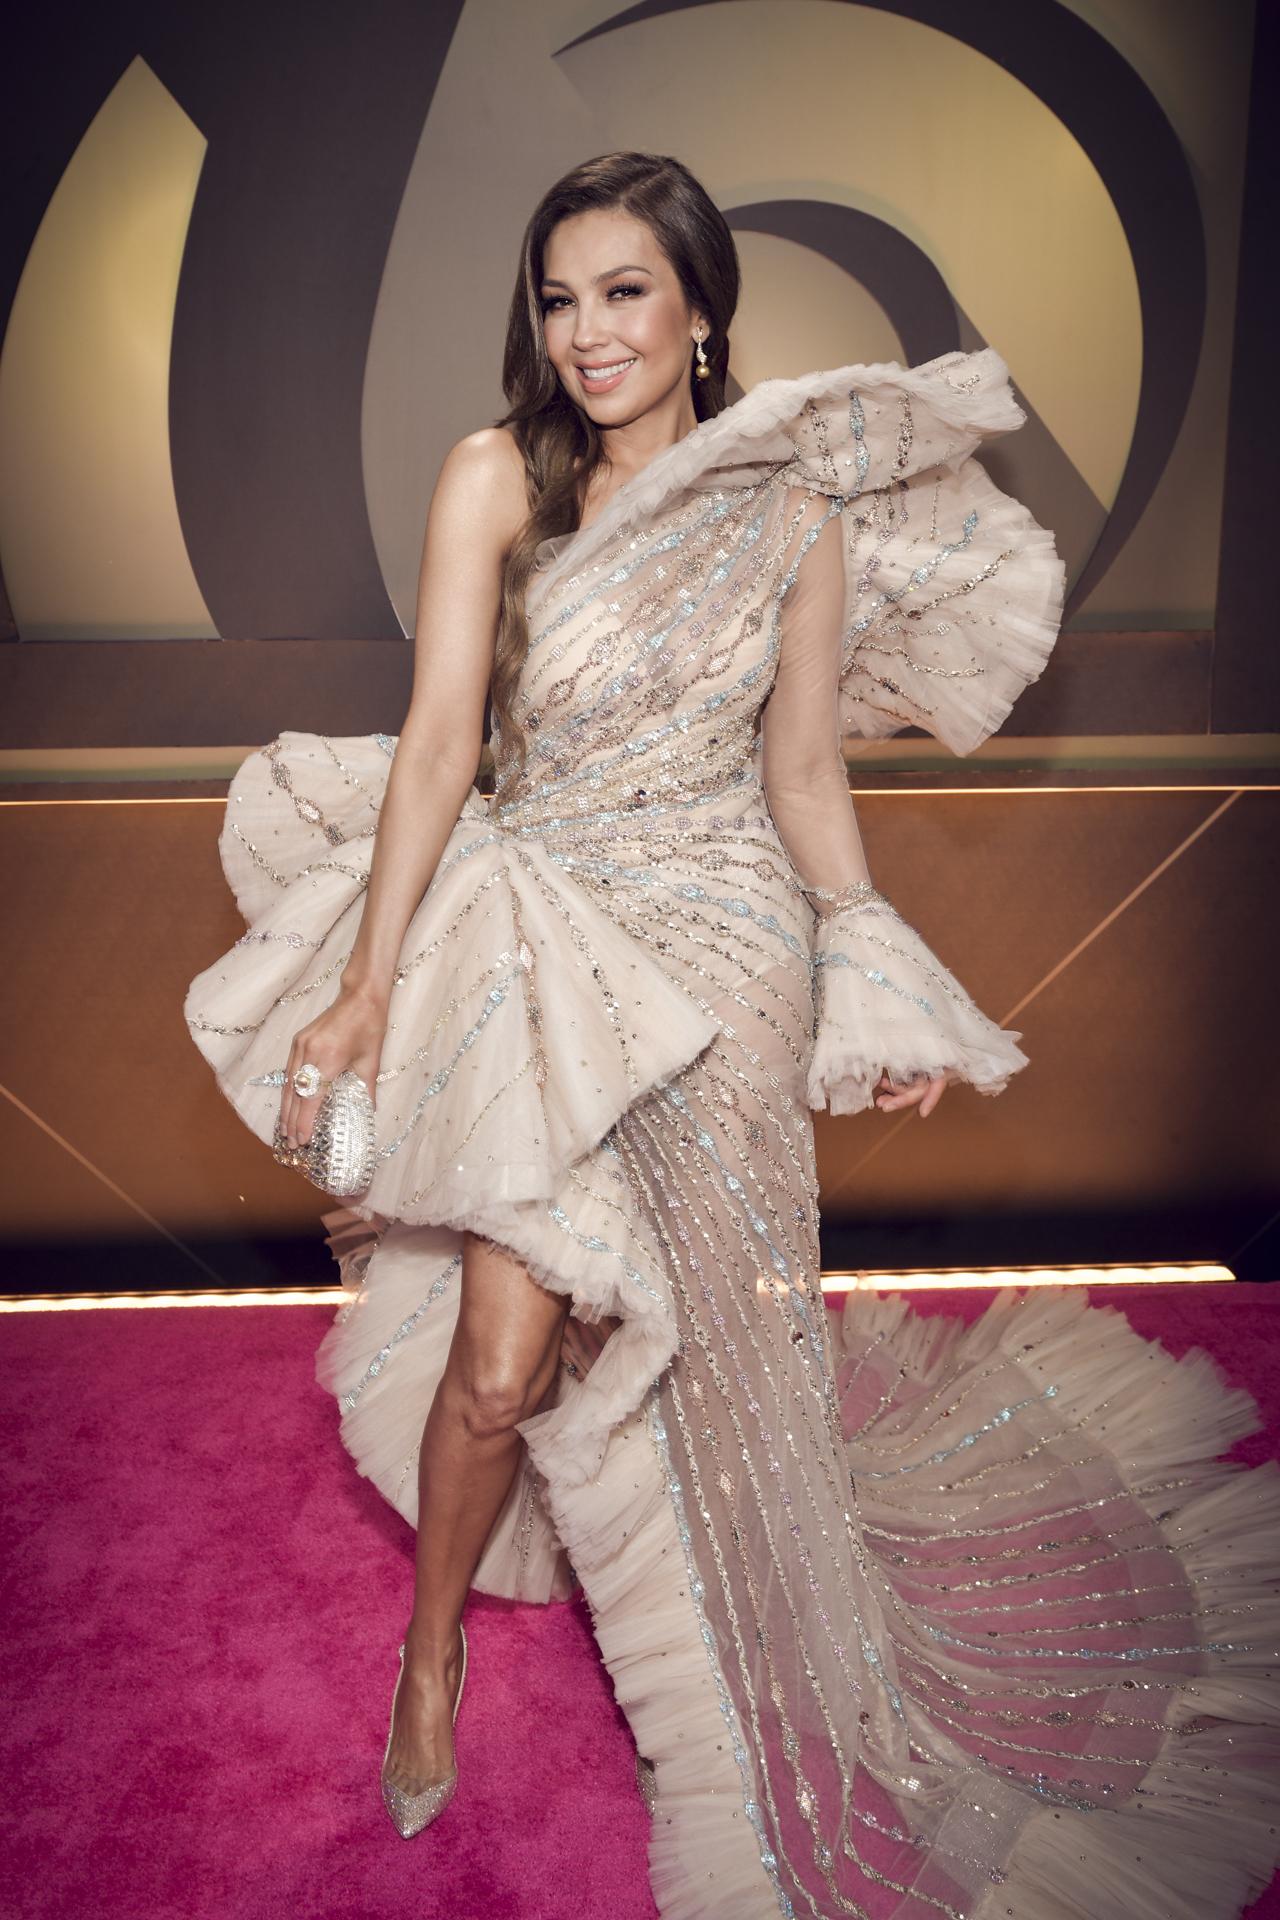 La cantante mexicana Thalía. (Suministrada/ Univision)